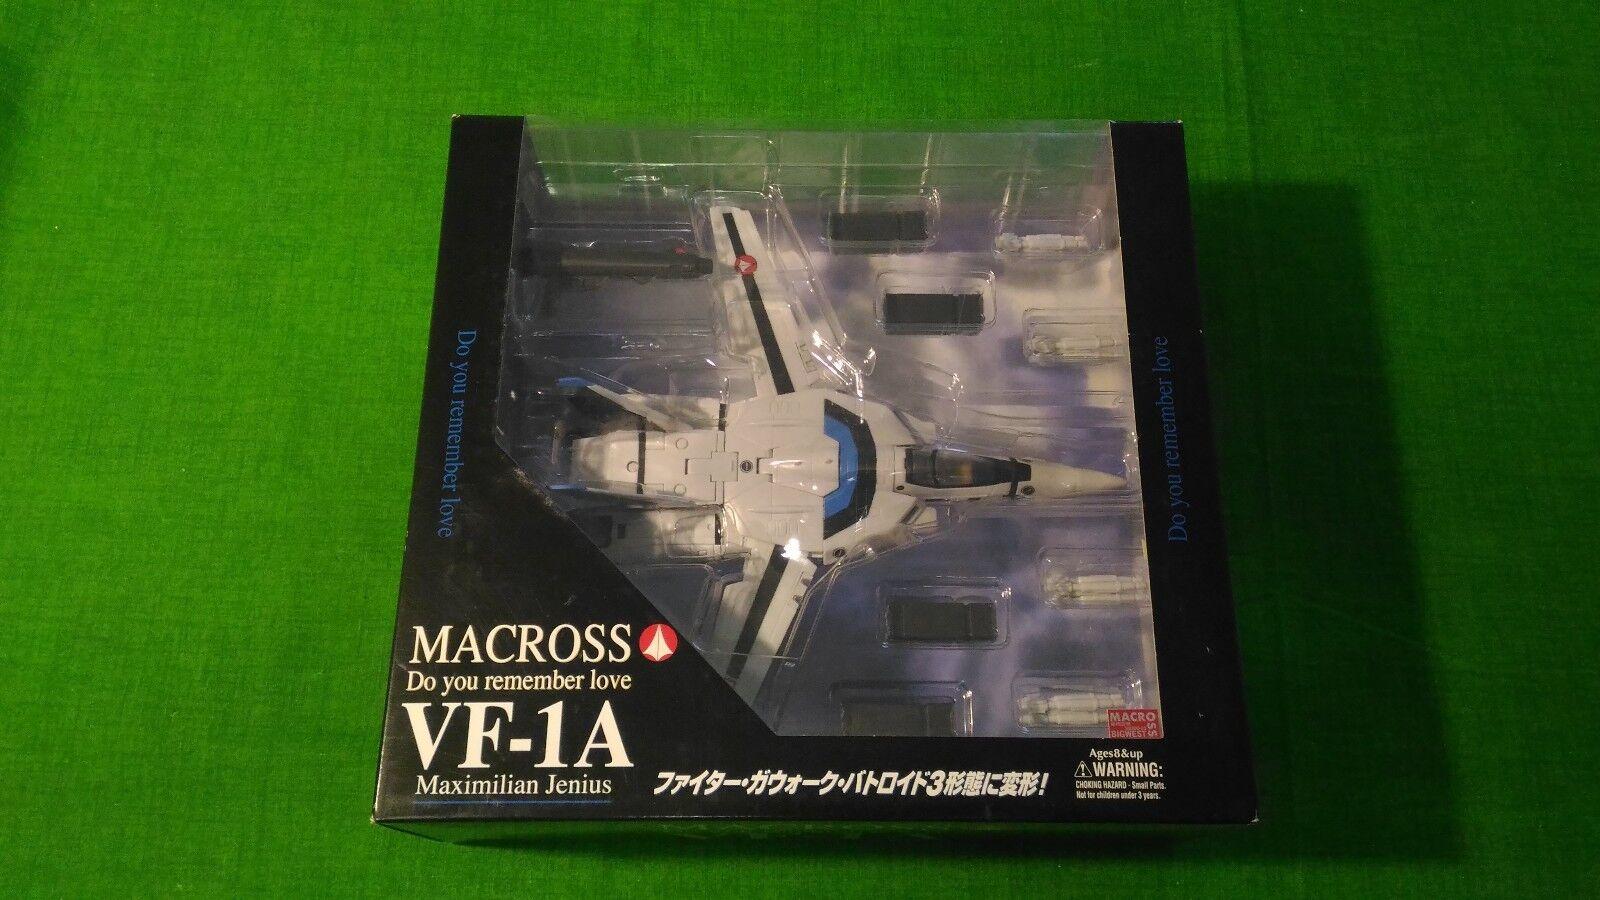 MACROSS robotech VF-1A Maximilian Jenius YAMATO